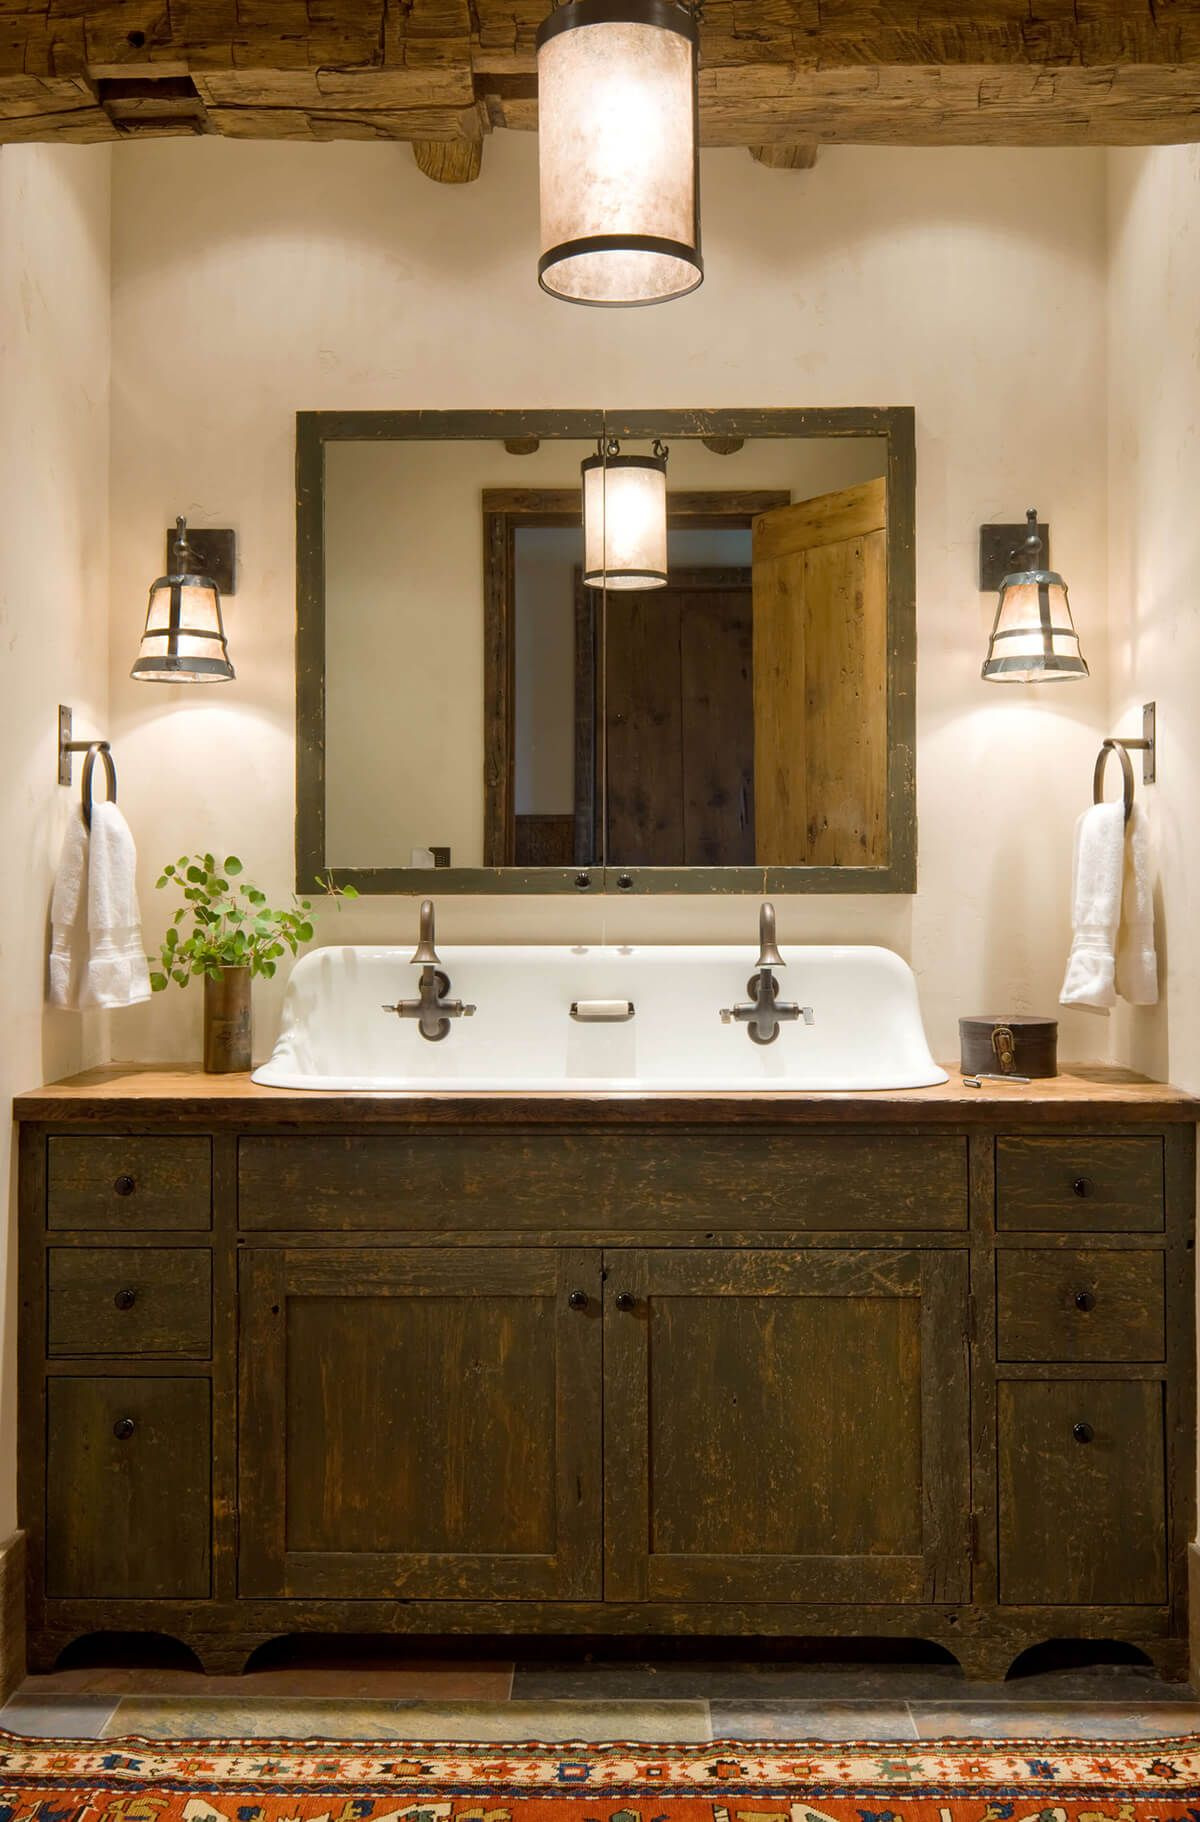 35 rustic bathroom vanity ideas to inspire your next on bathroom renovation ideas modern id=58361